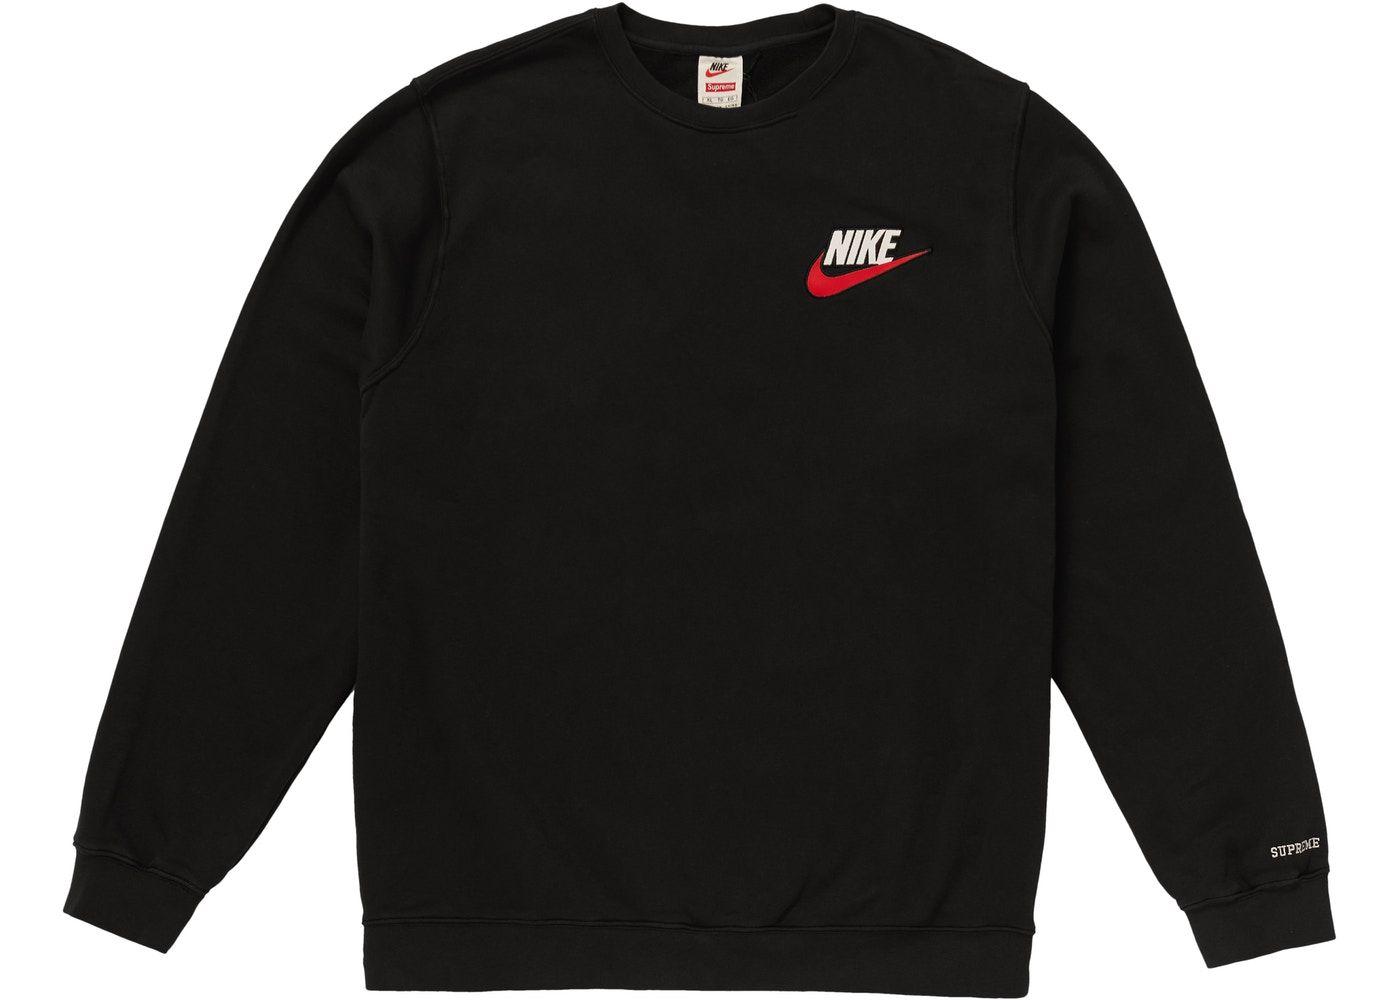 Supreme Nike Crewneck Black Nike Crewneck Nike Crewneck Sweatshirt Black Sweatshirts [ 1000 x 1400 Pixel ]